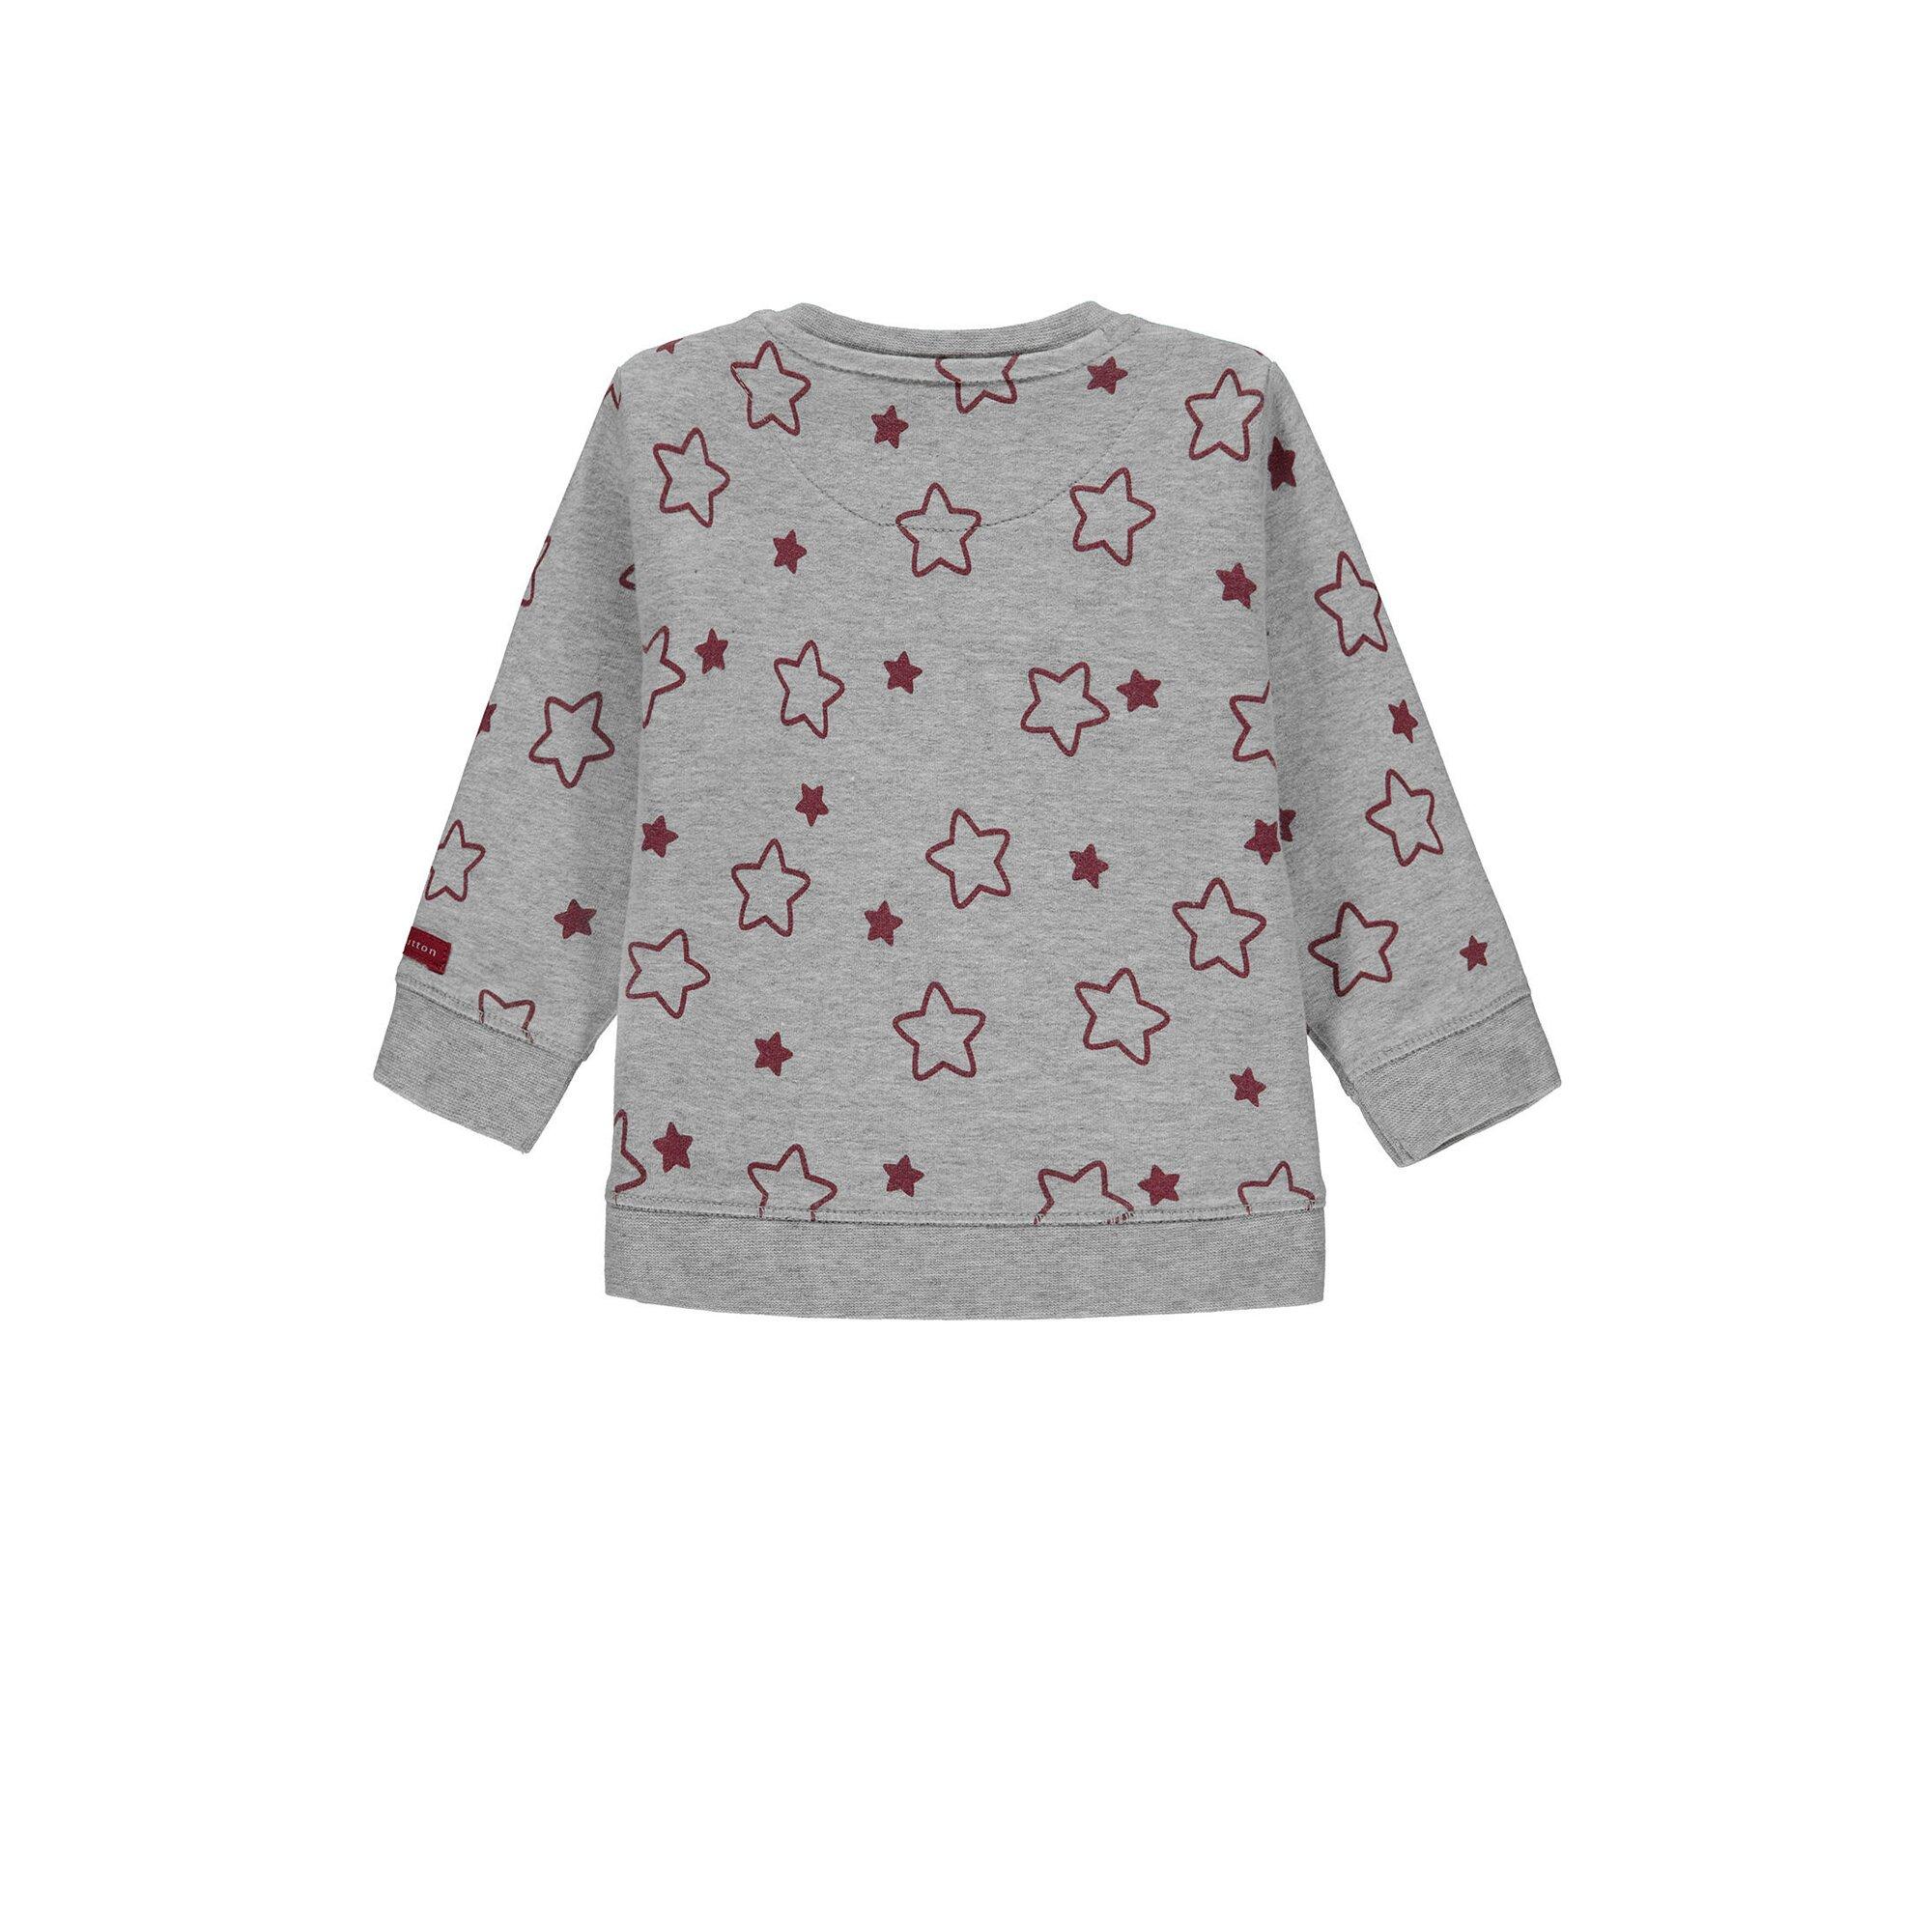 bellybutton-sweatshirt-unisex-allover-print, 15.95 EUR @ babywalz-de